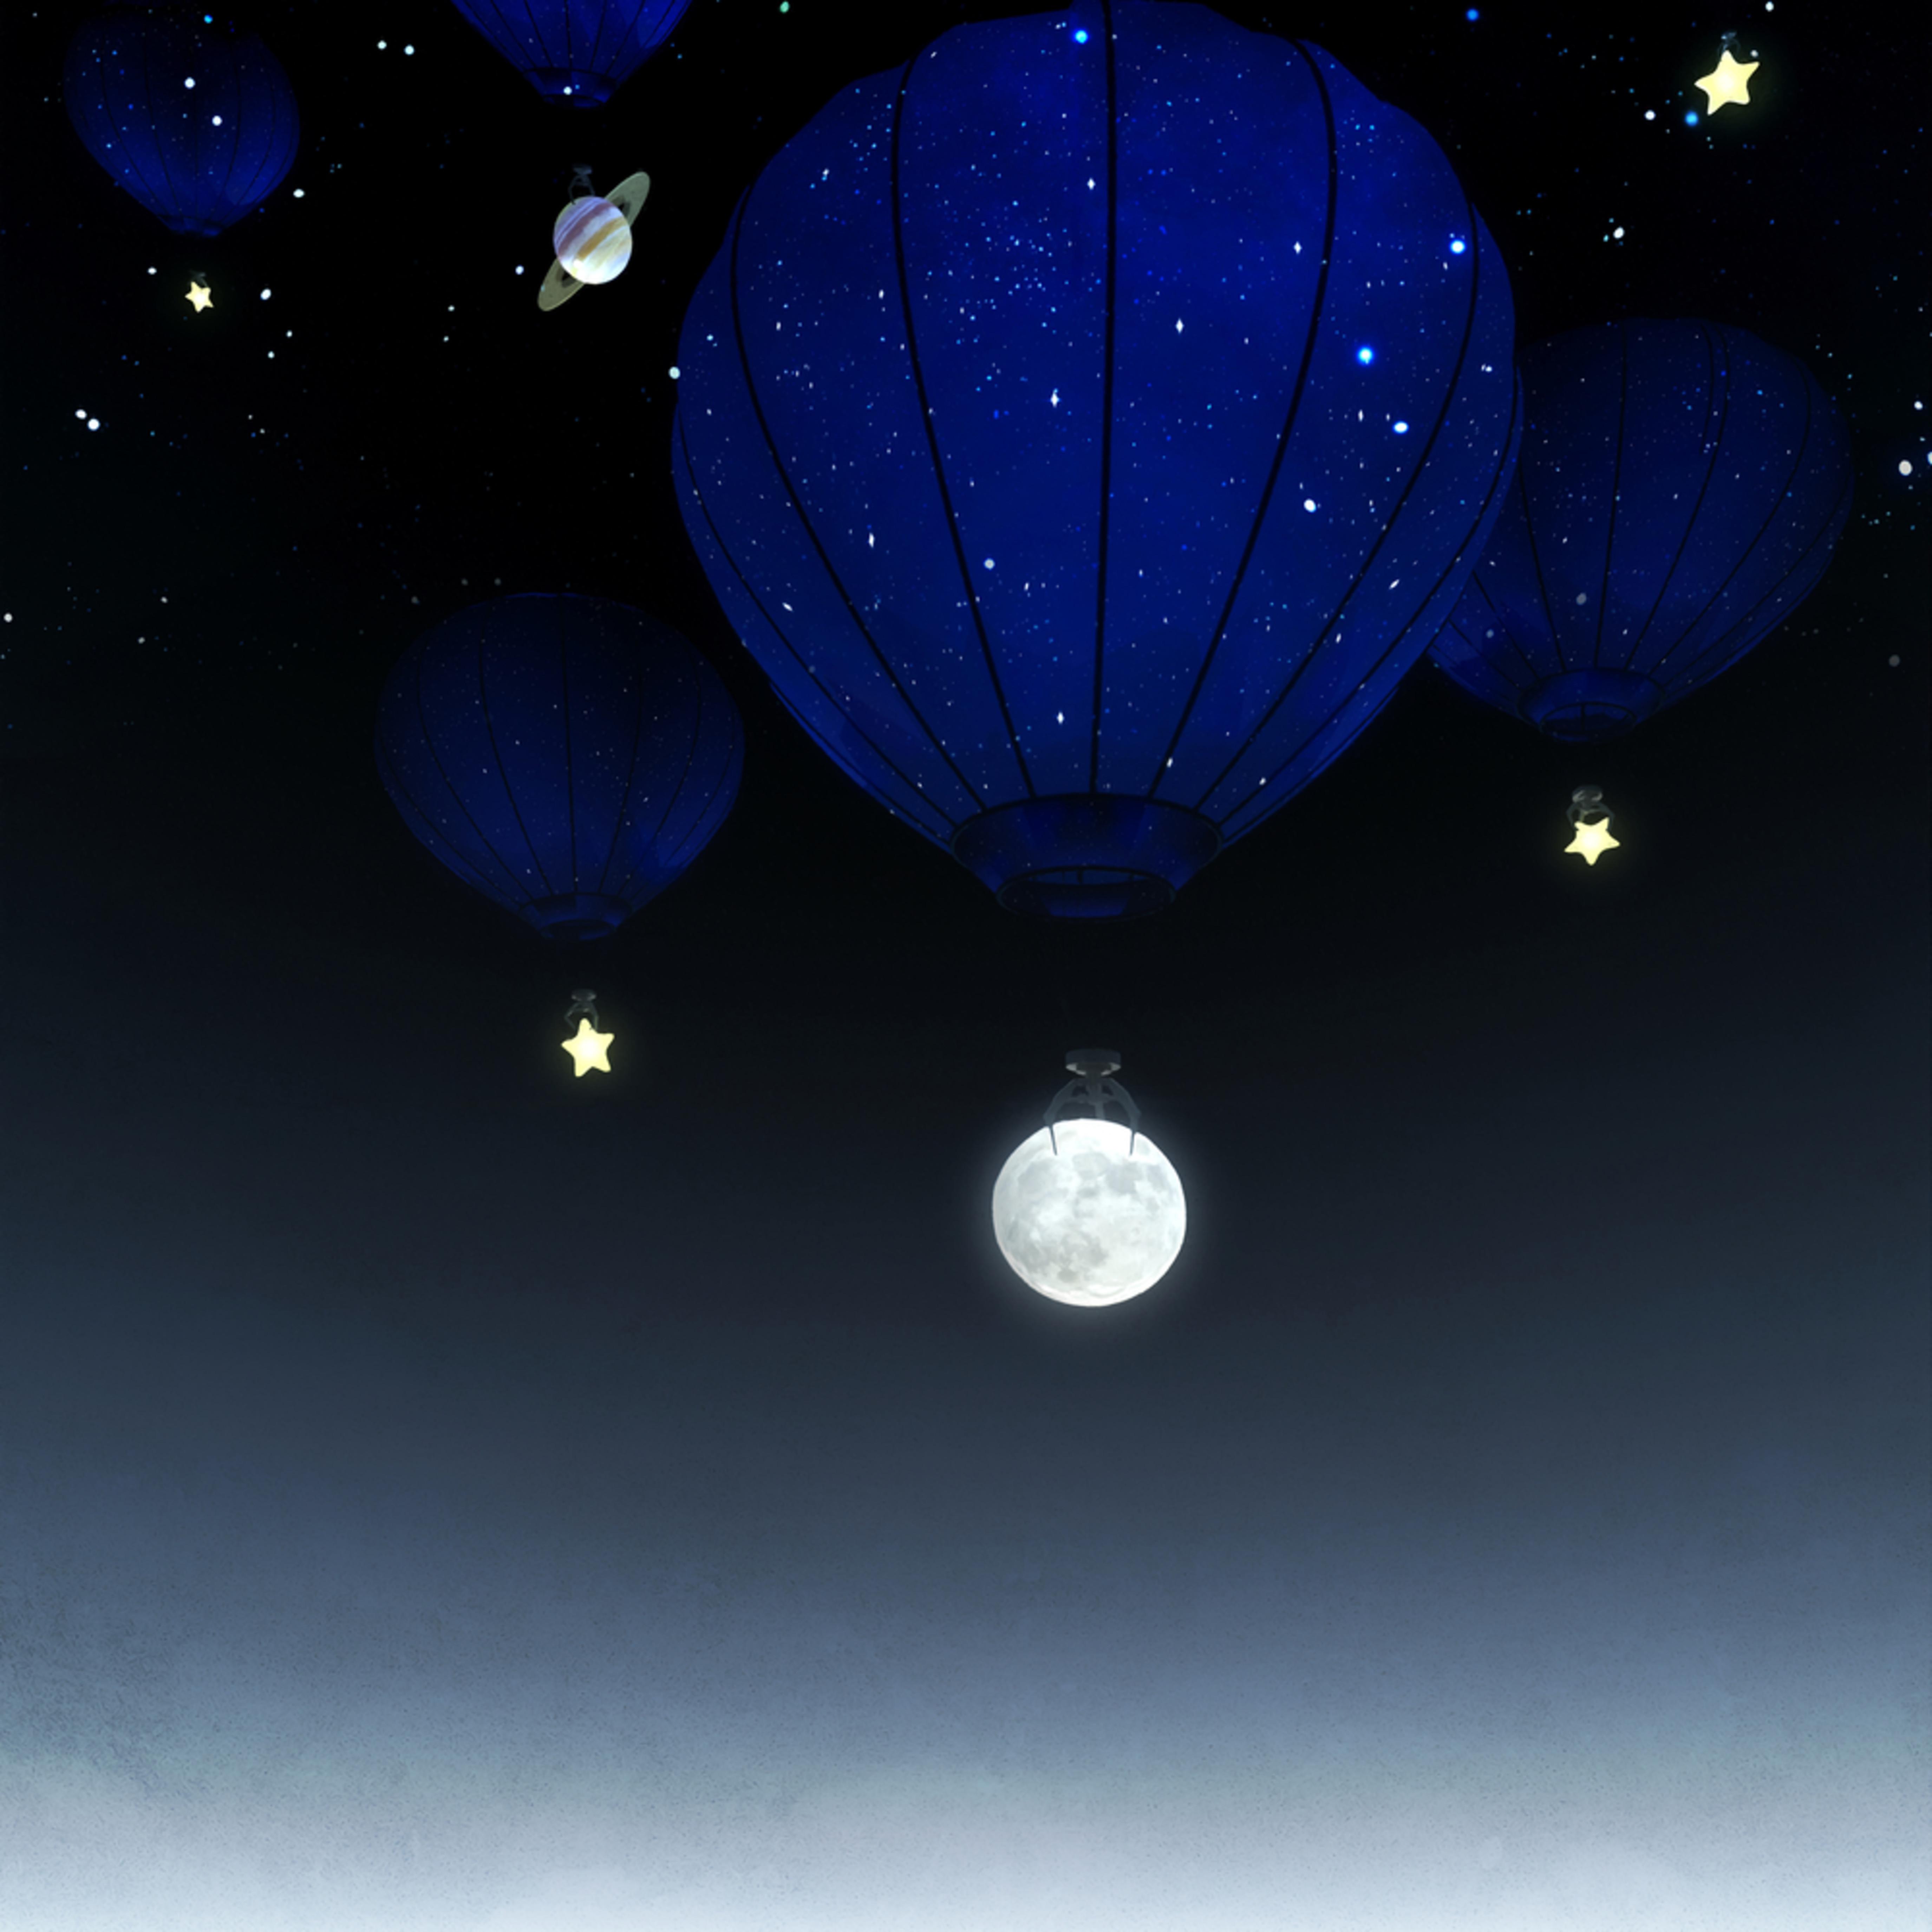 Cdecker moonrise 7800 xupk7k